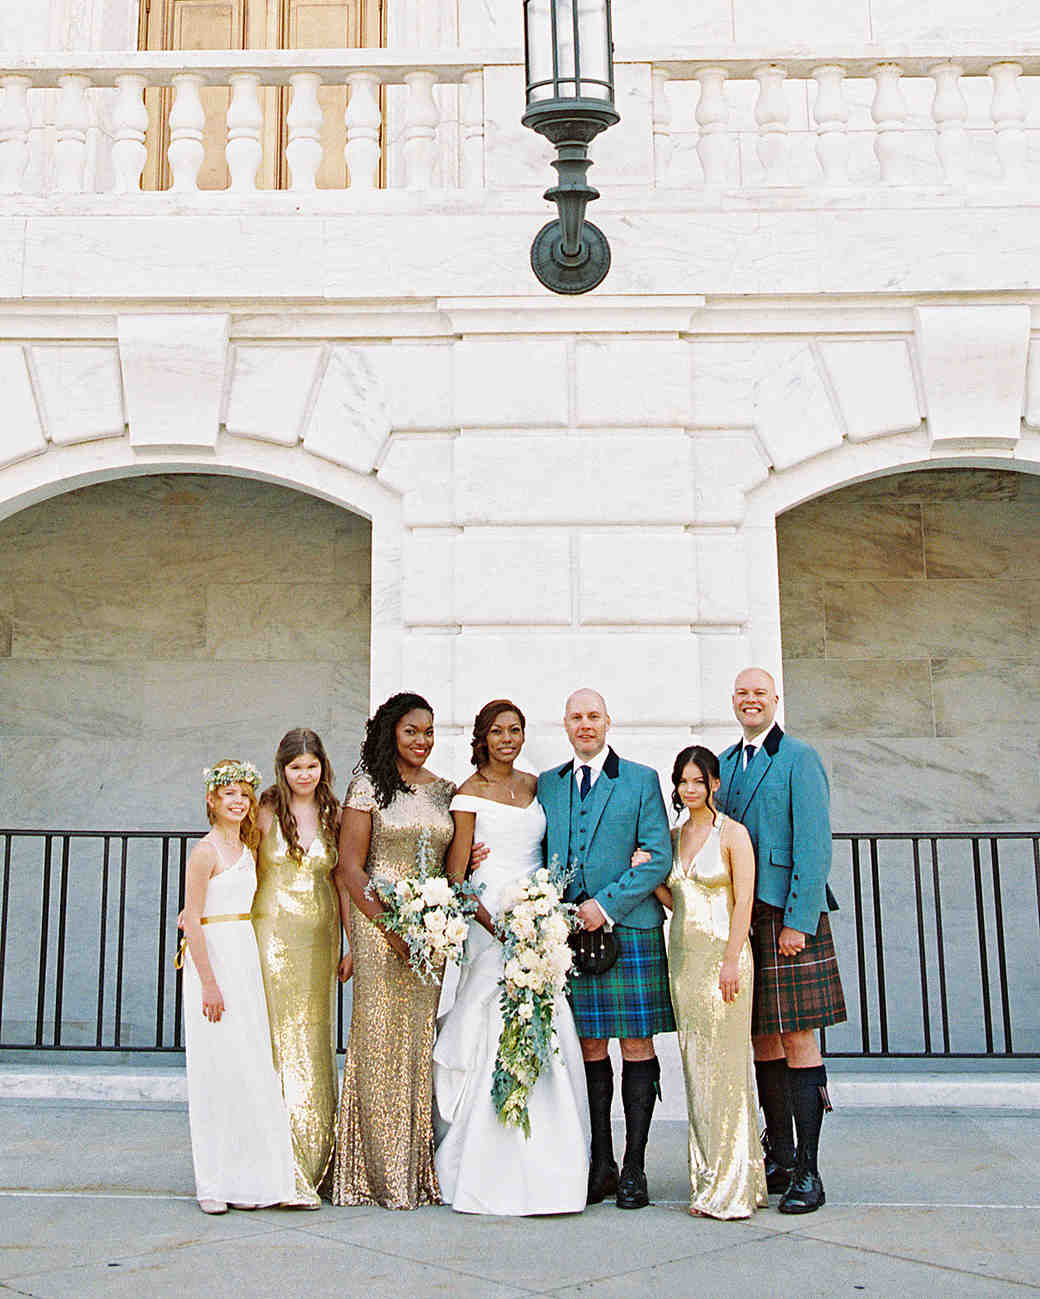 meki ian wedding michigan bridal party